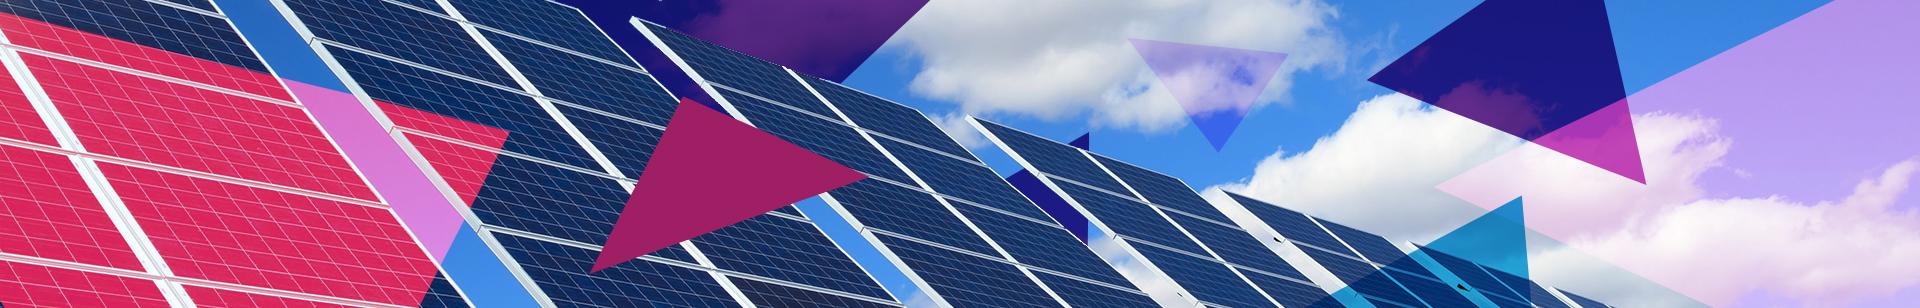 banner image solar